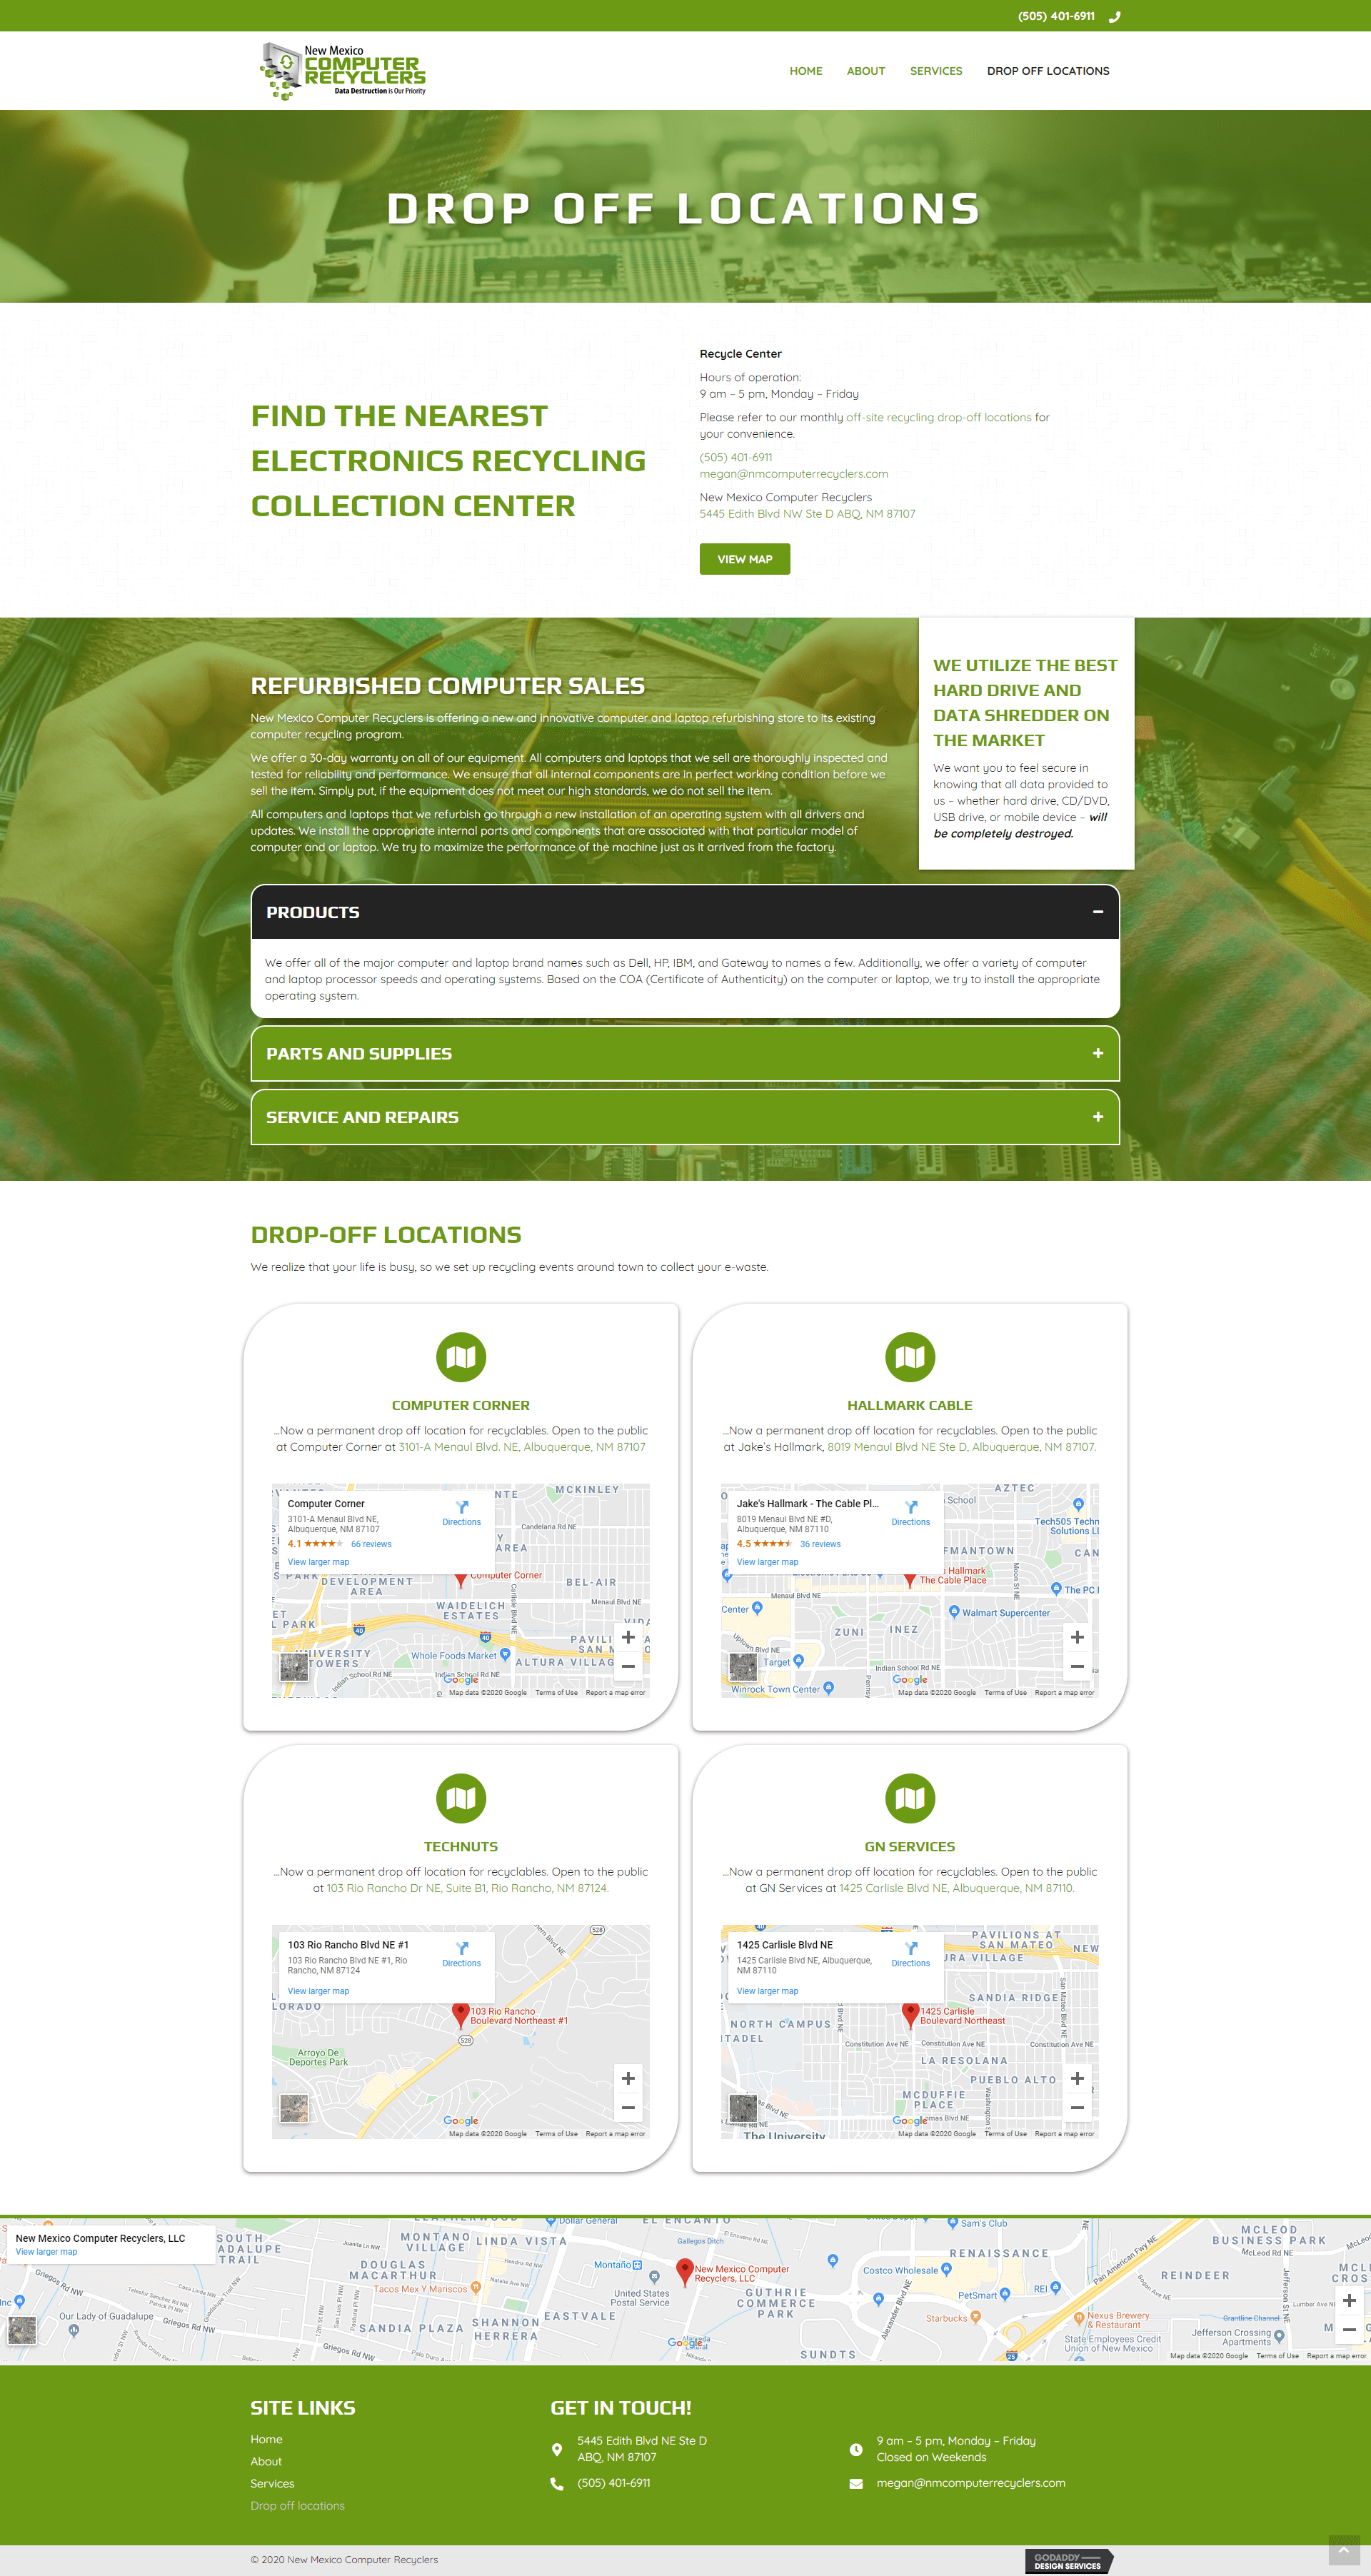 screencapture-nmcomputerrecyclers-drop-off-locations